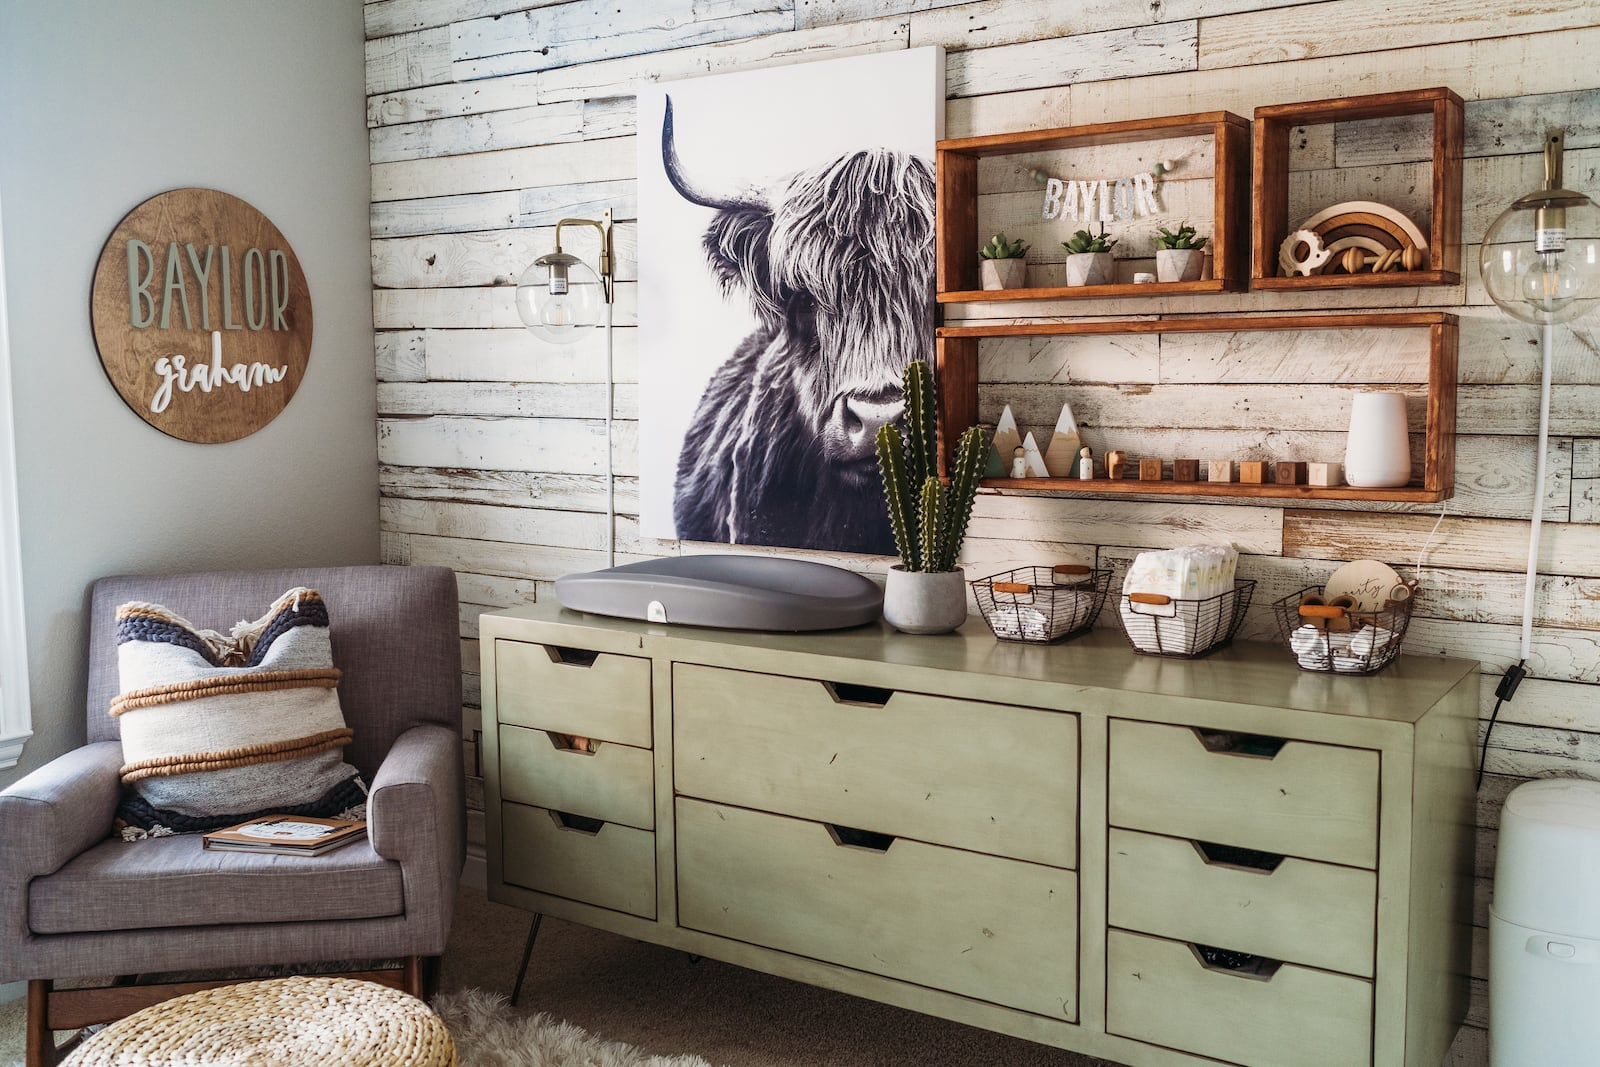 Best Custom Handmade Furniture Company in Kansas City | Unruh